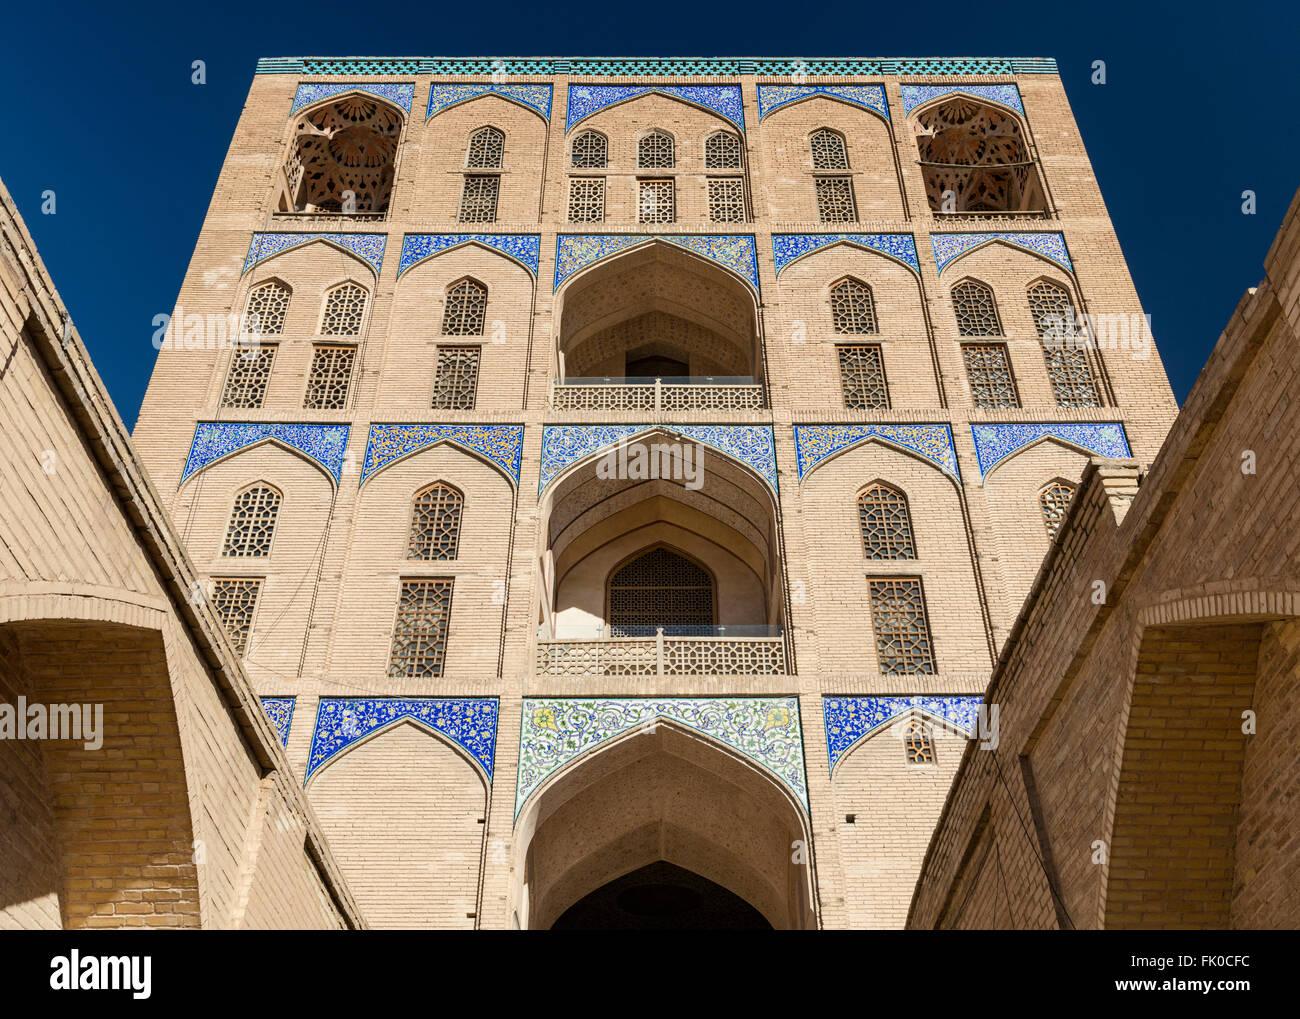 Bright sunshine on Qapu Palace, Imam Square, Isfahan, Iran - Stock Image